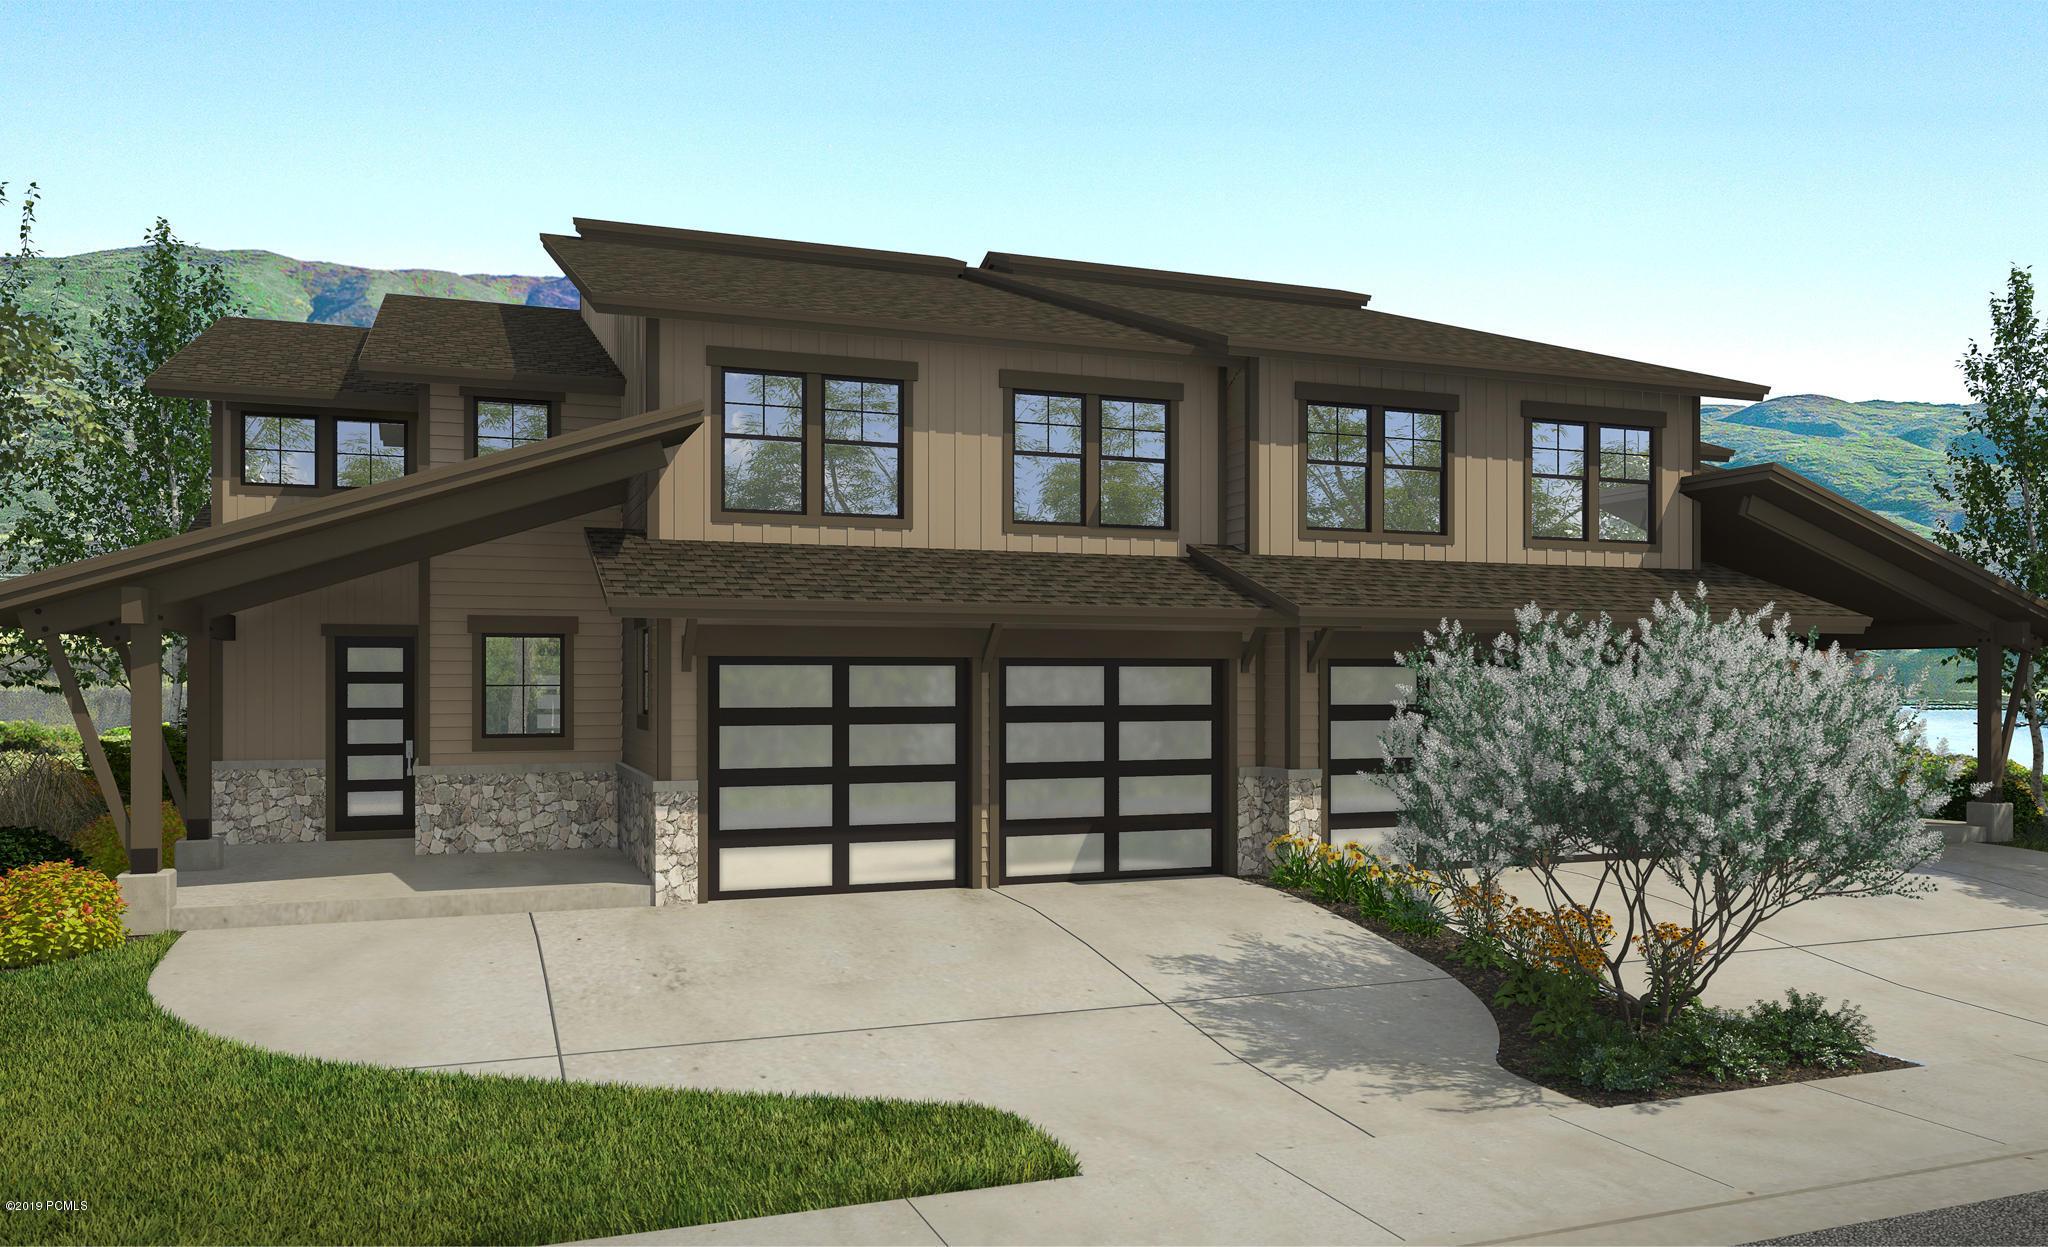 10061 Meer Circle, Heber City, Utah 84032, 4 Bedrooms Bedrooms, ,4 BathroomsBathrooms,Condominium,For Sale,Meer,11908295